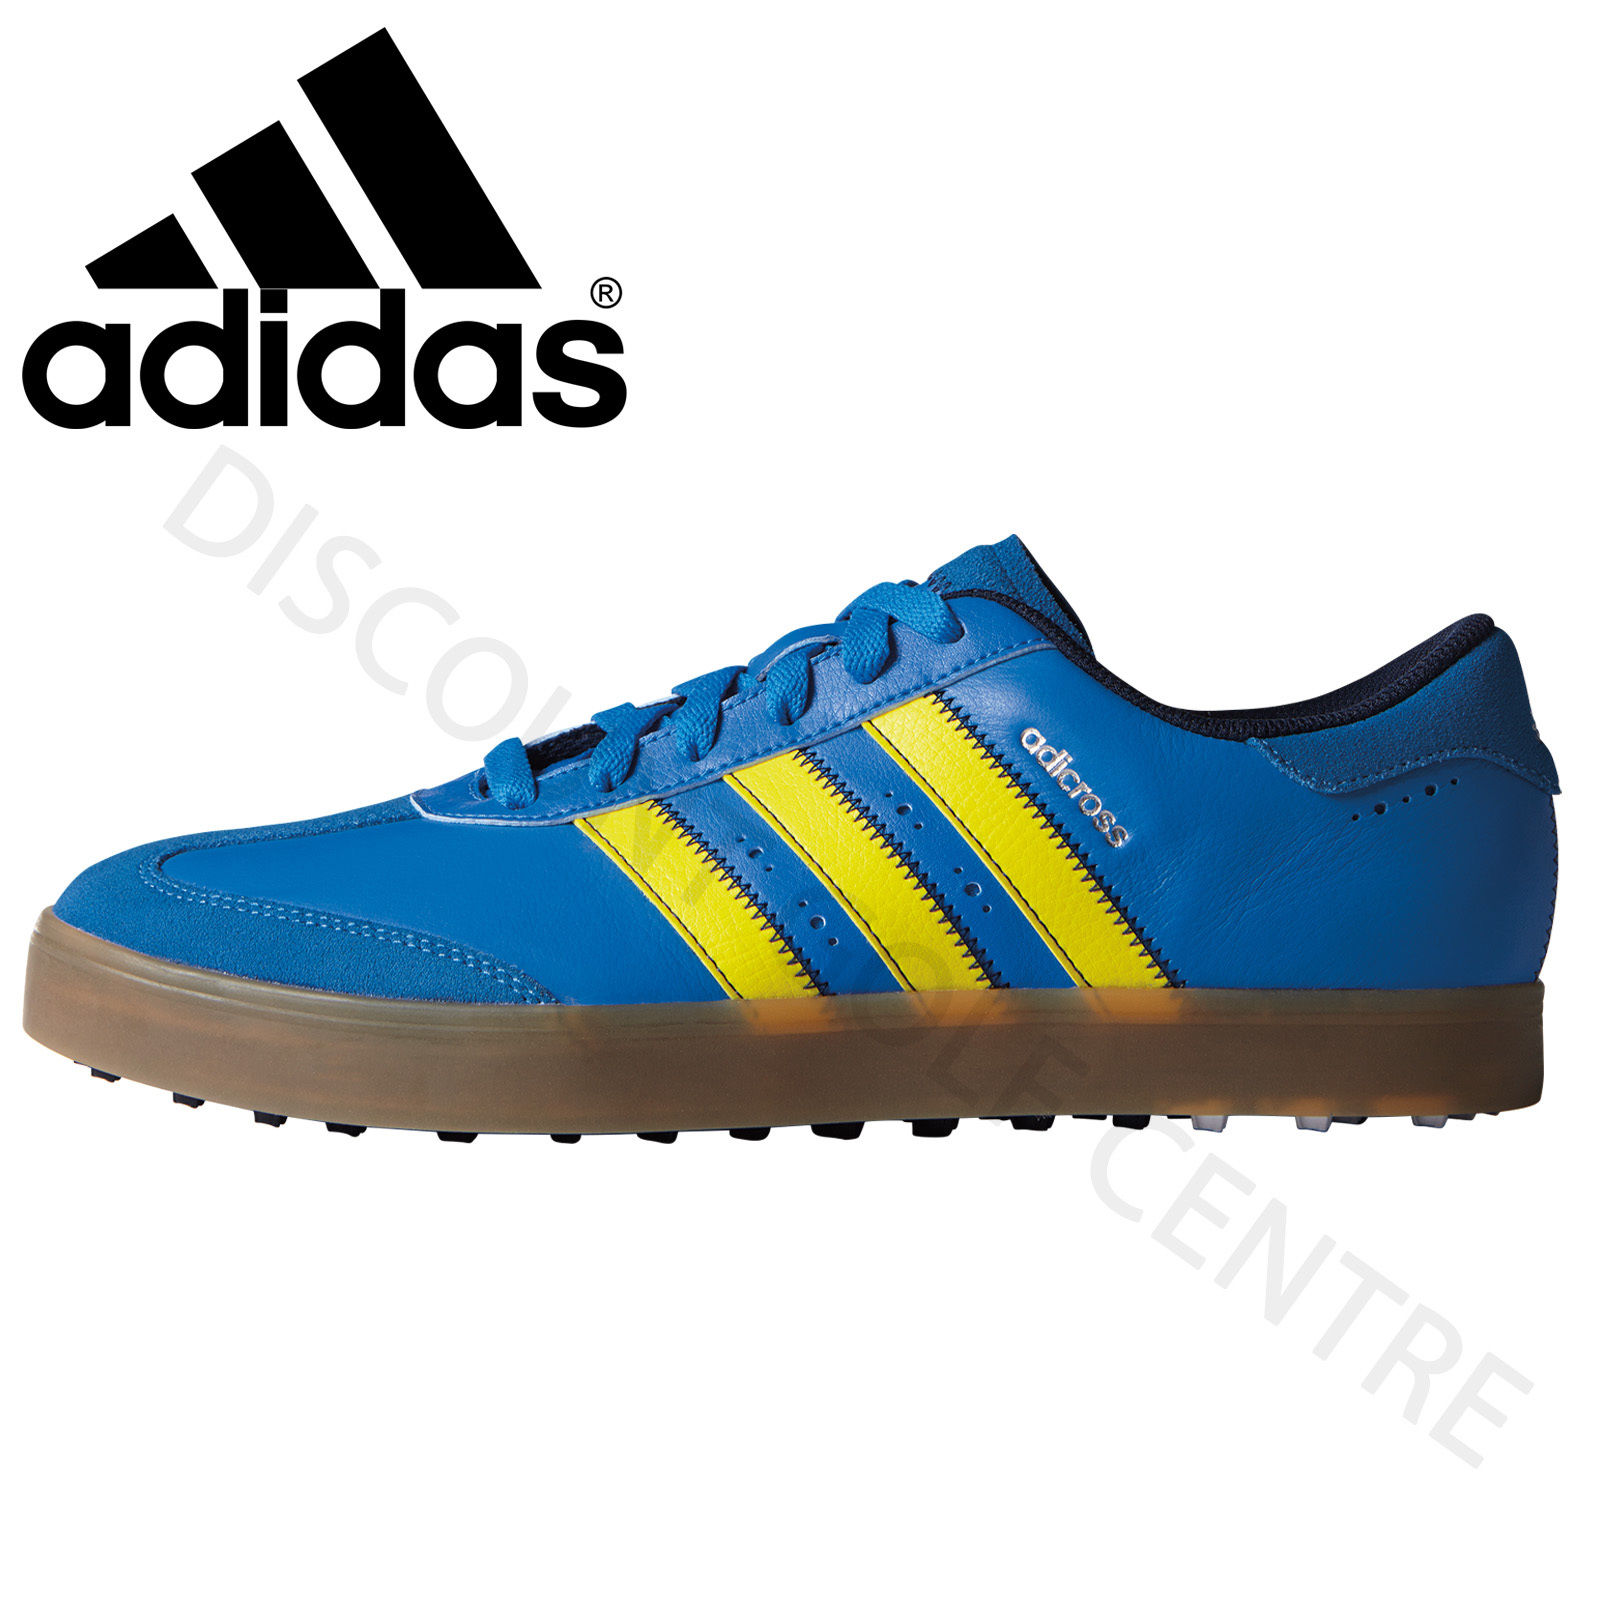 Adidas  Adicross V Spikeless Mens Golf Shoes Wide Fitting